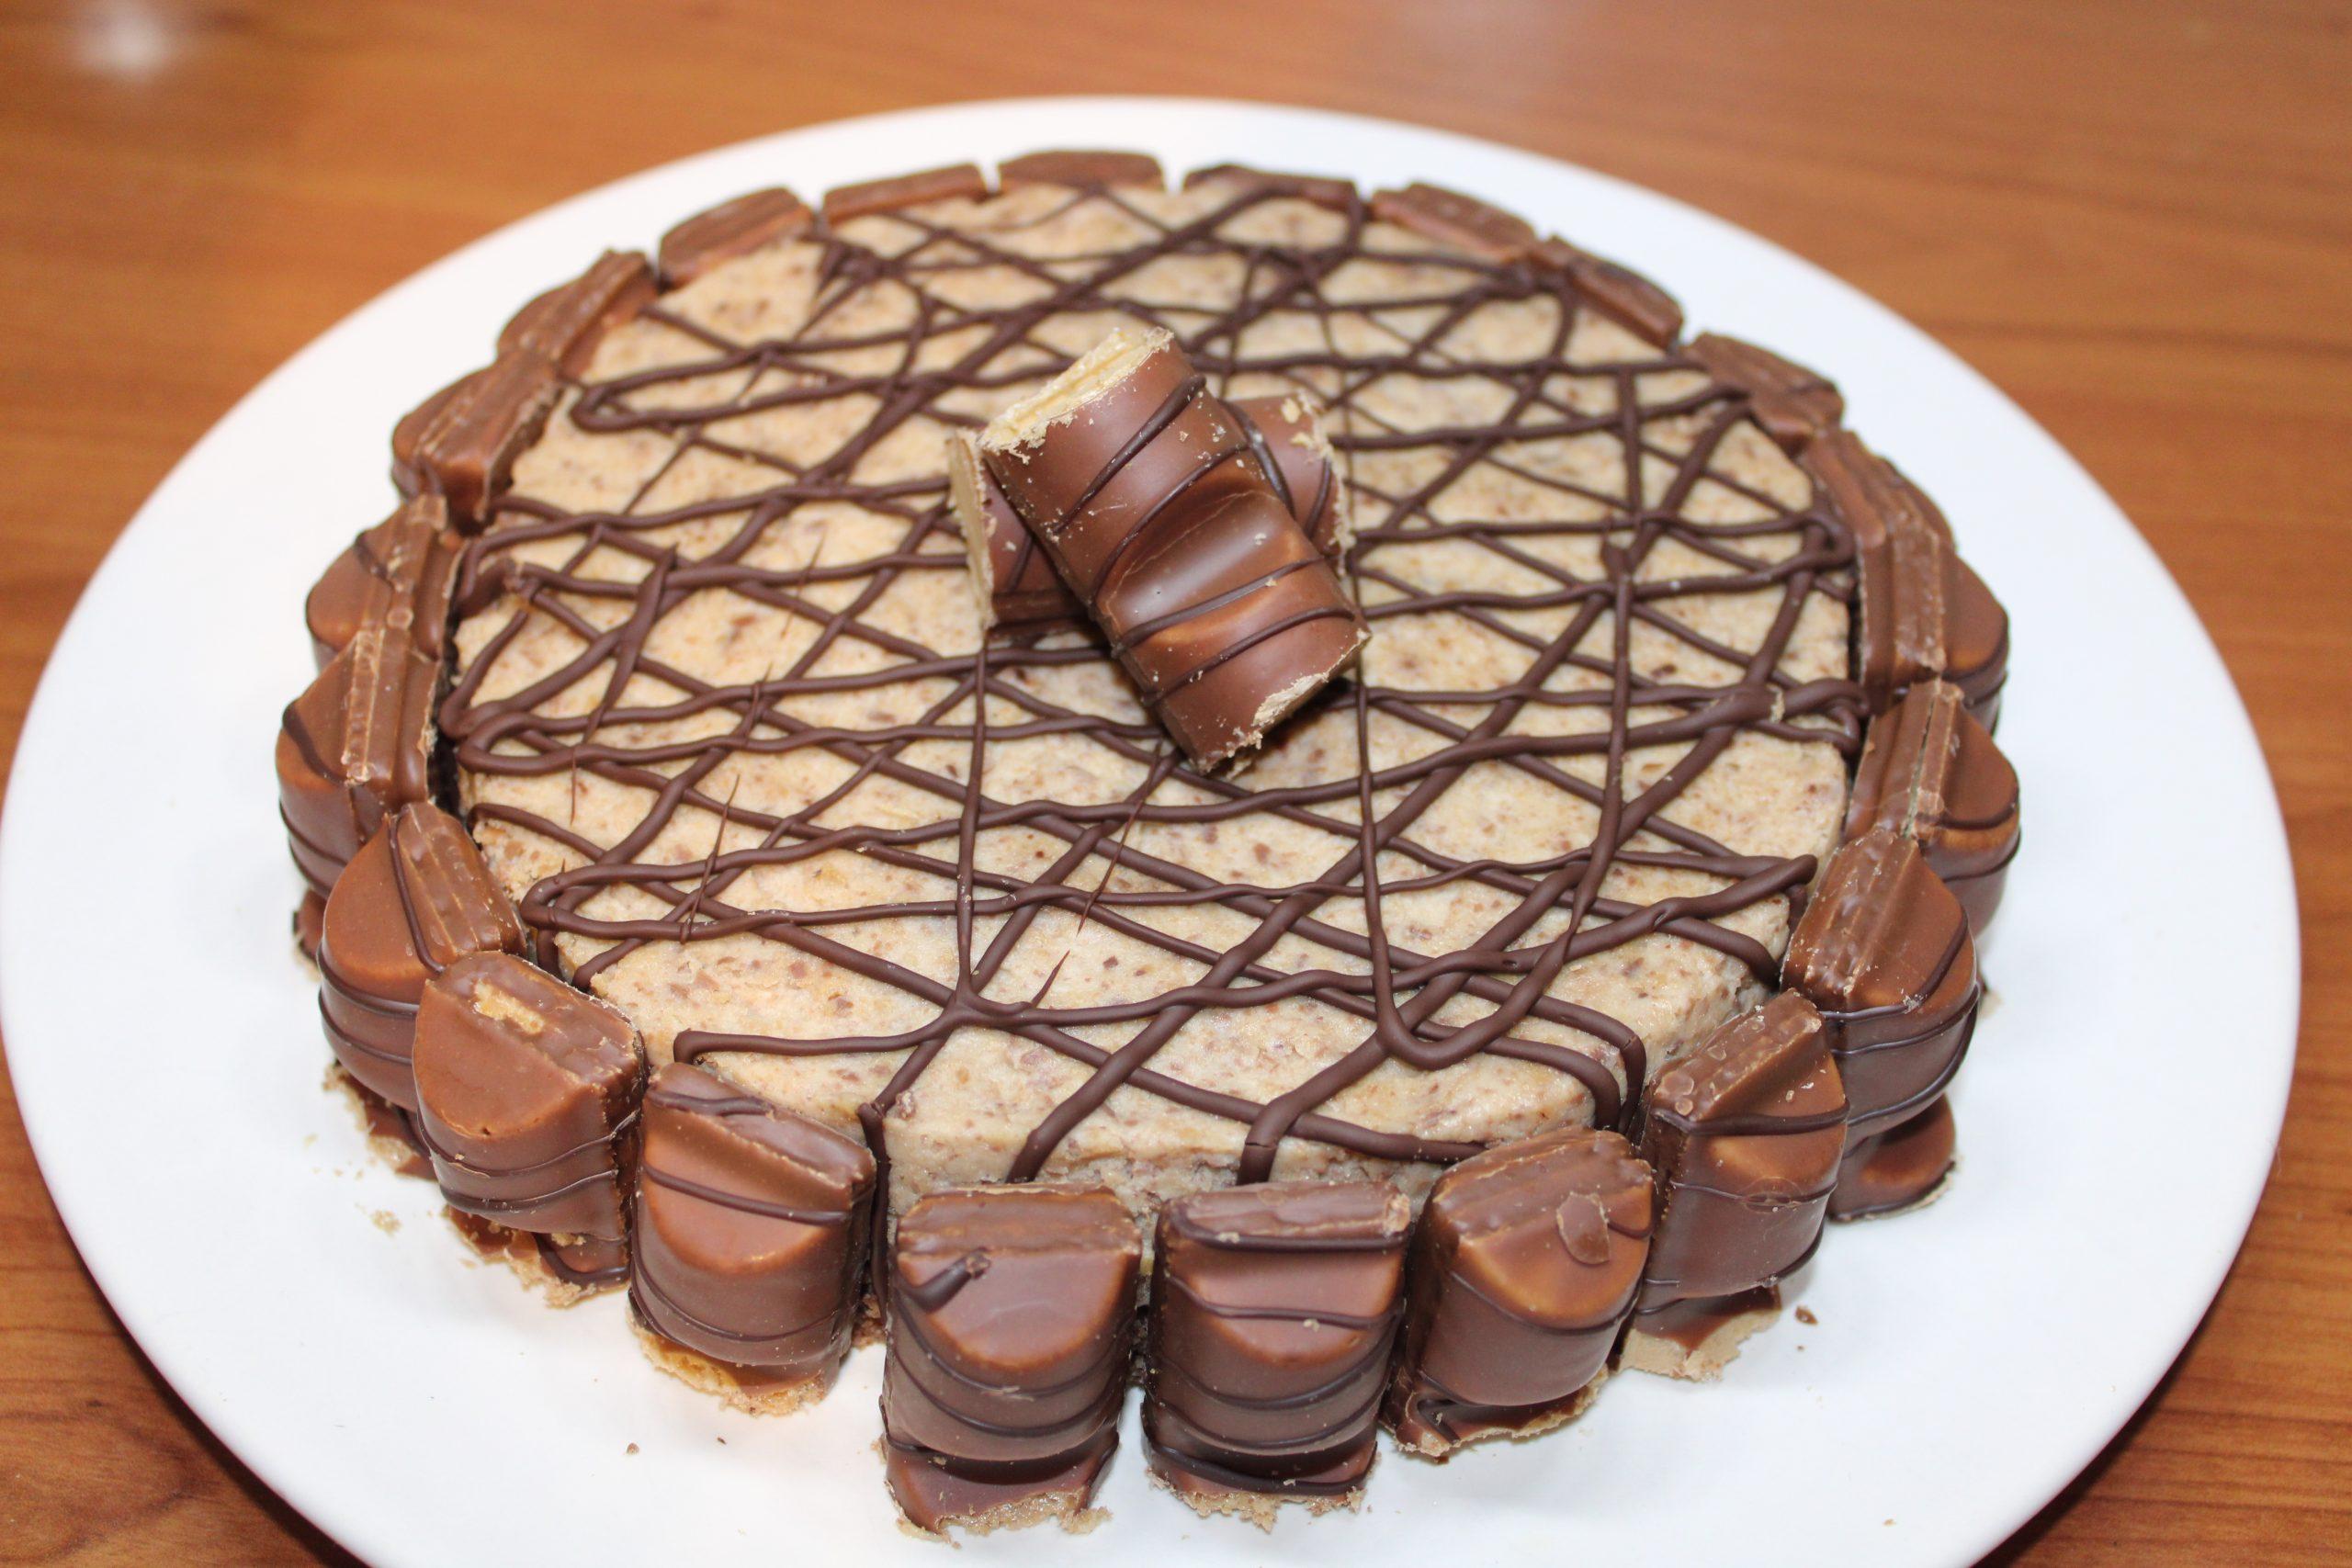 Recept Bueno taart no bake